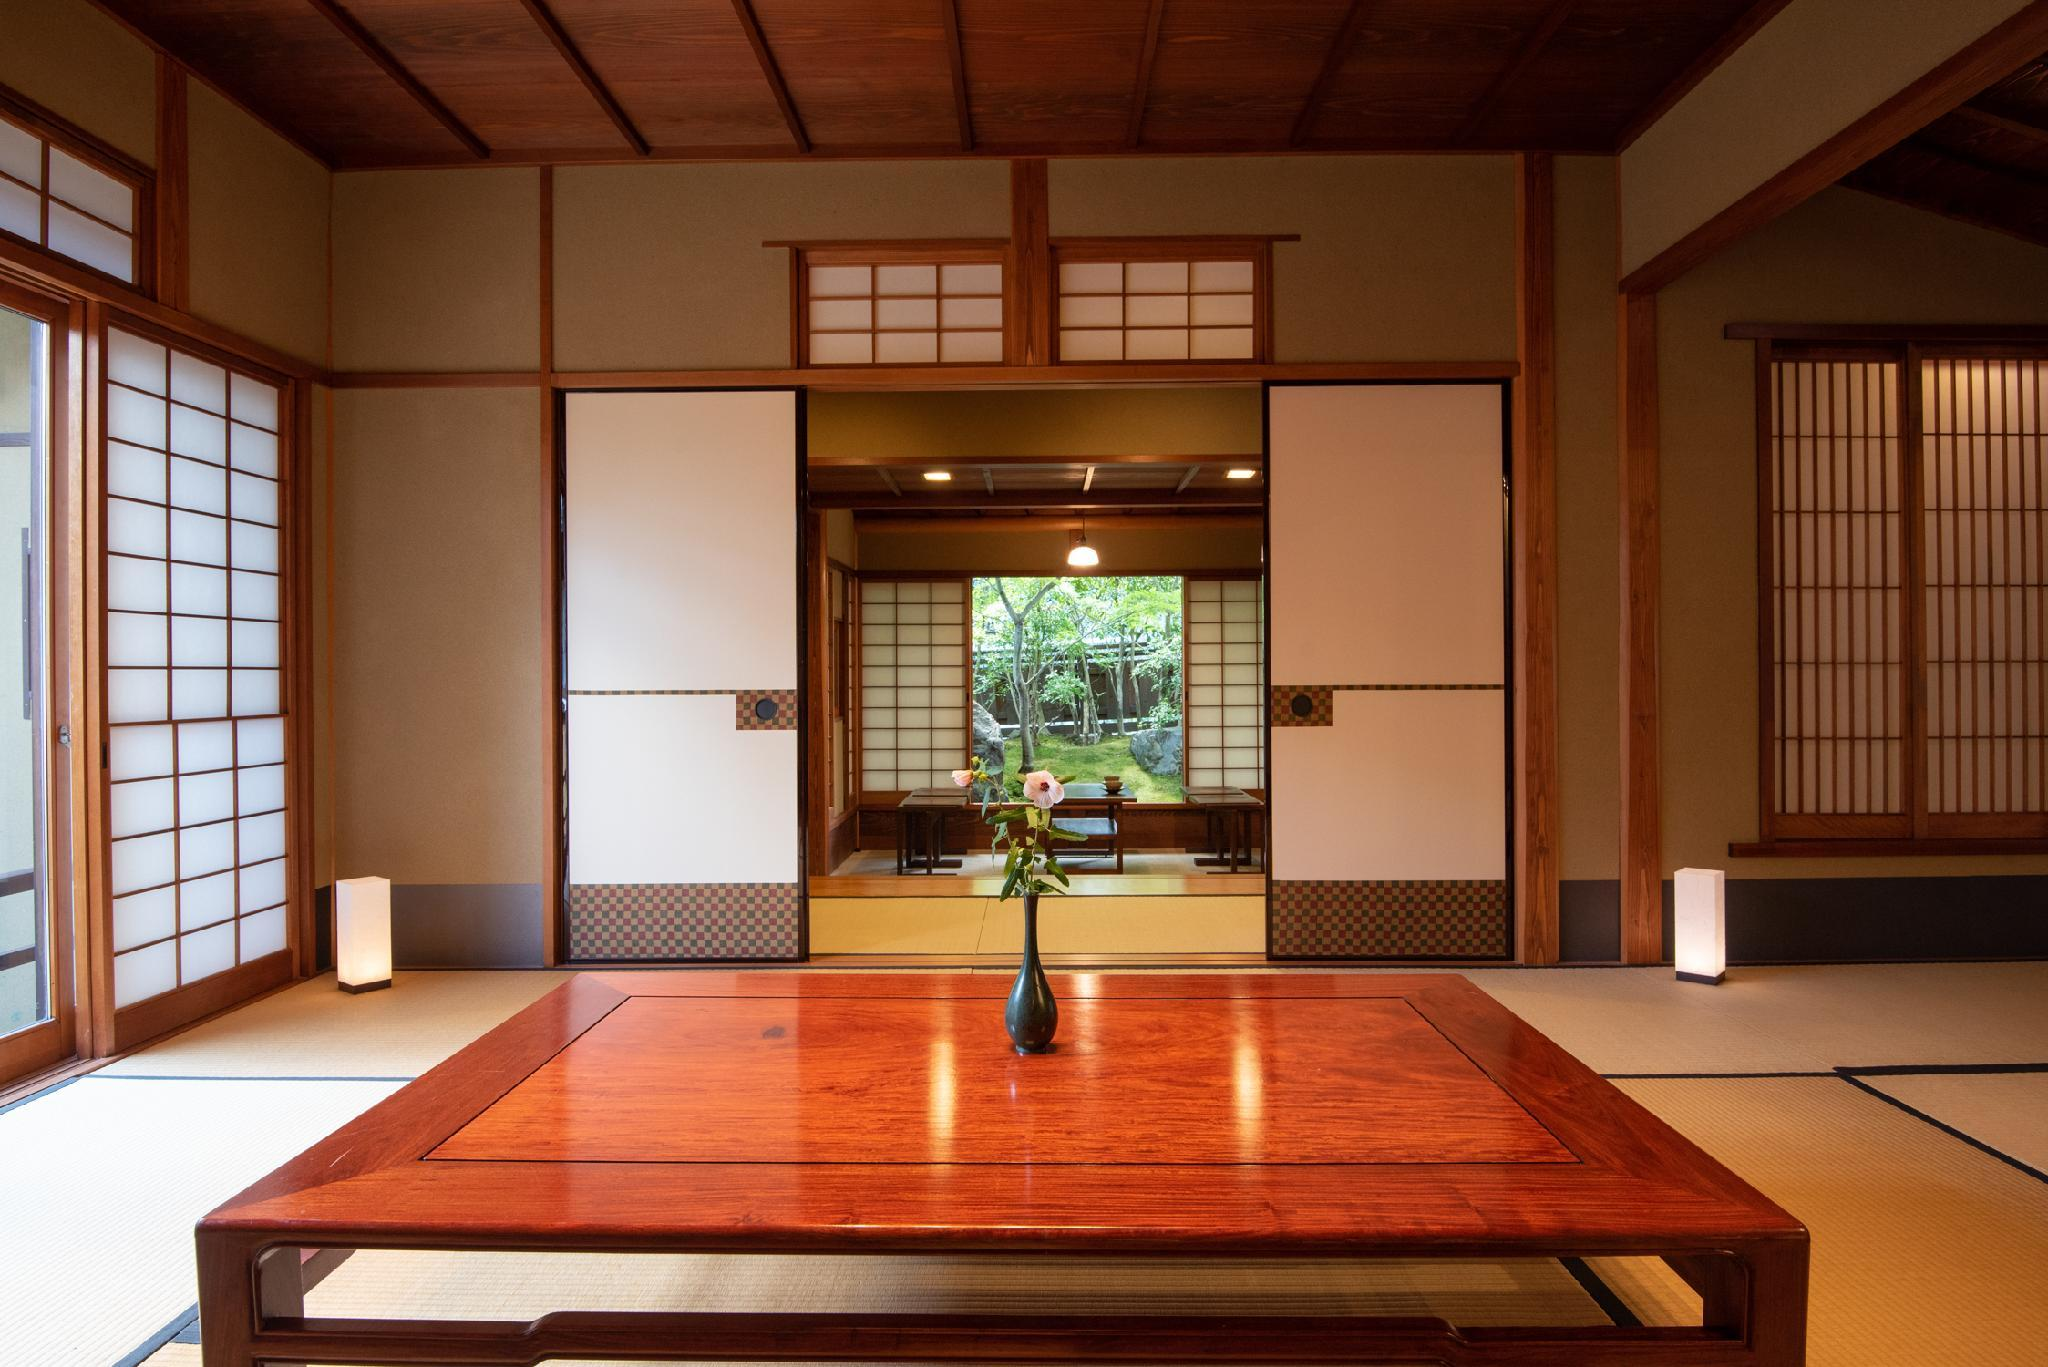 Kyoto Trad Suite  143sqm  CalmandConv Near Kinkakuji